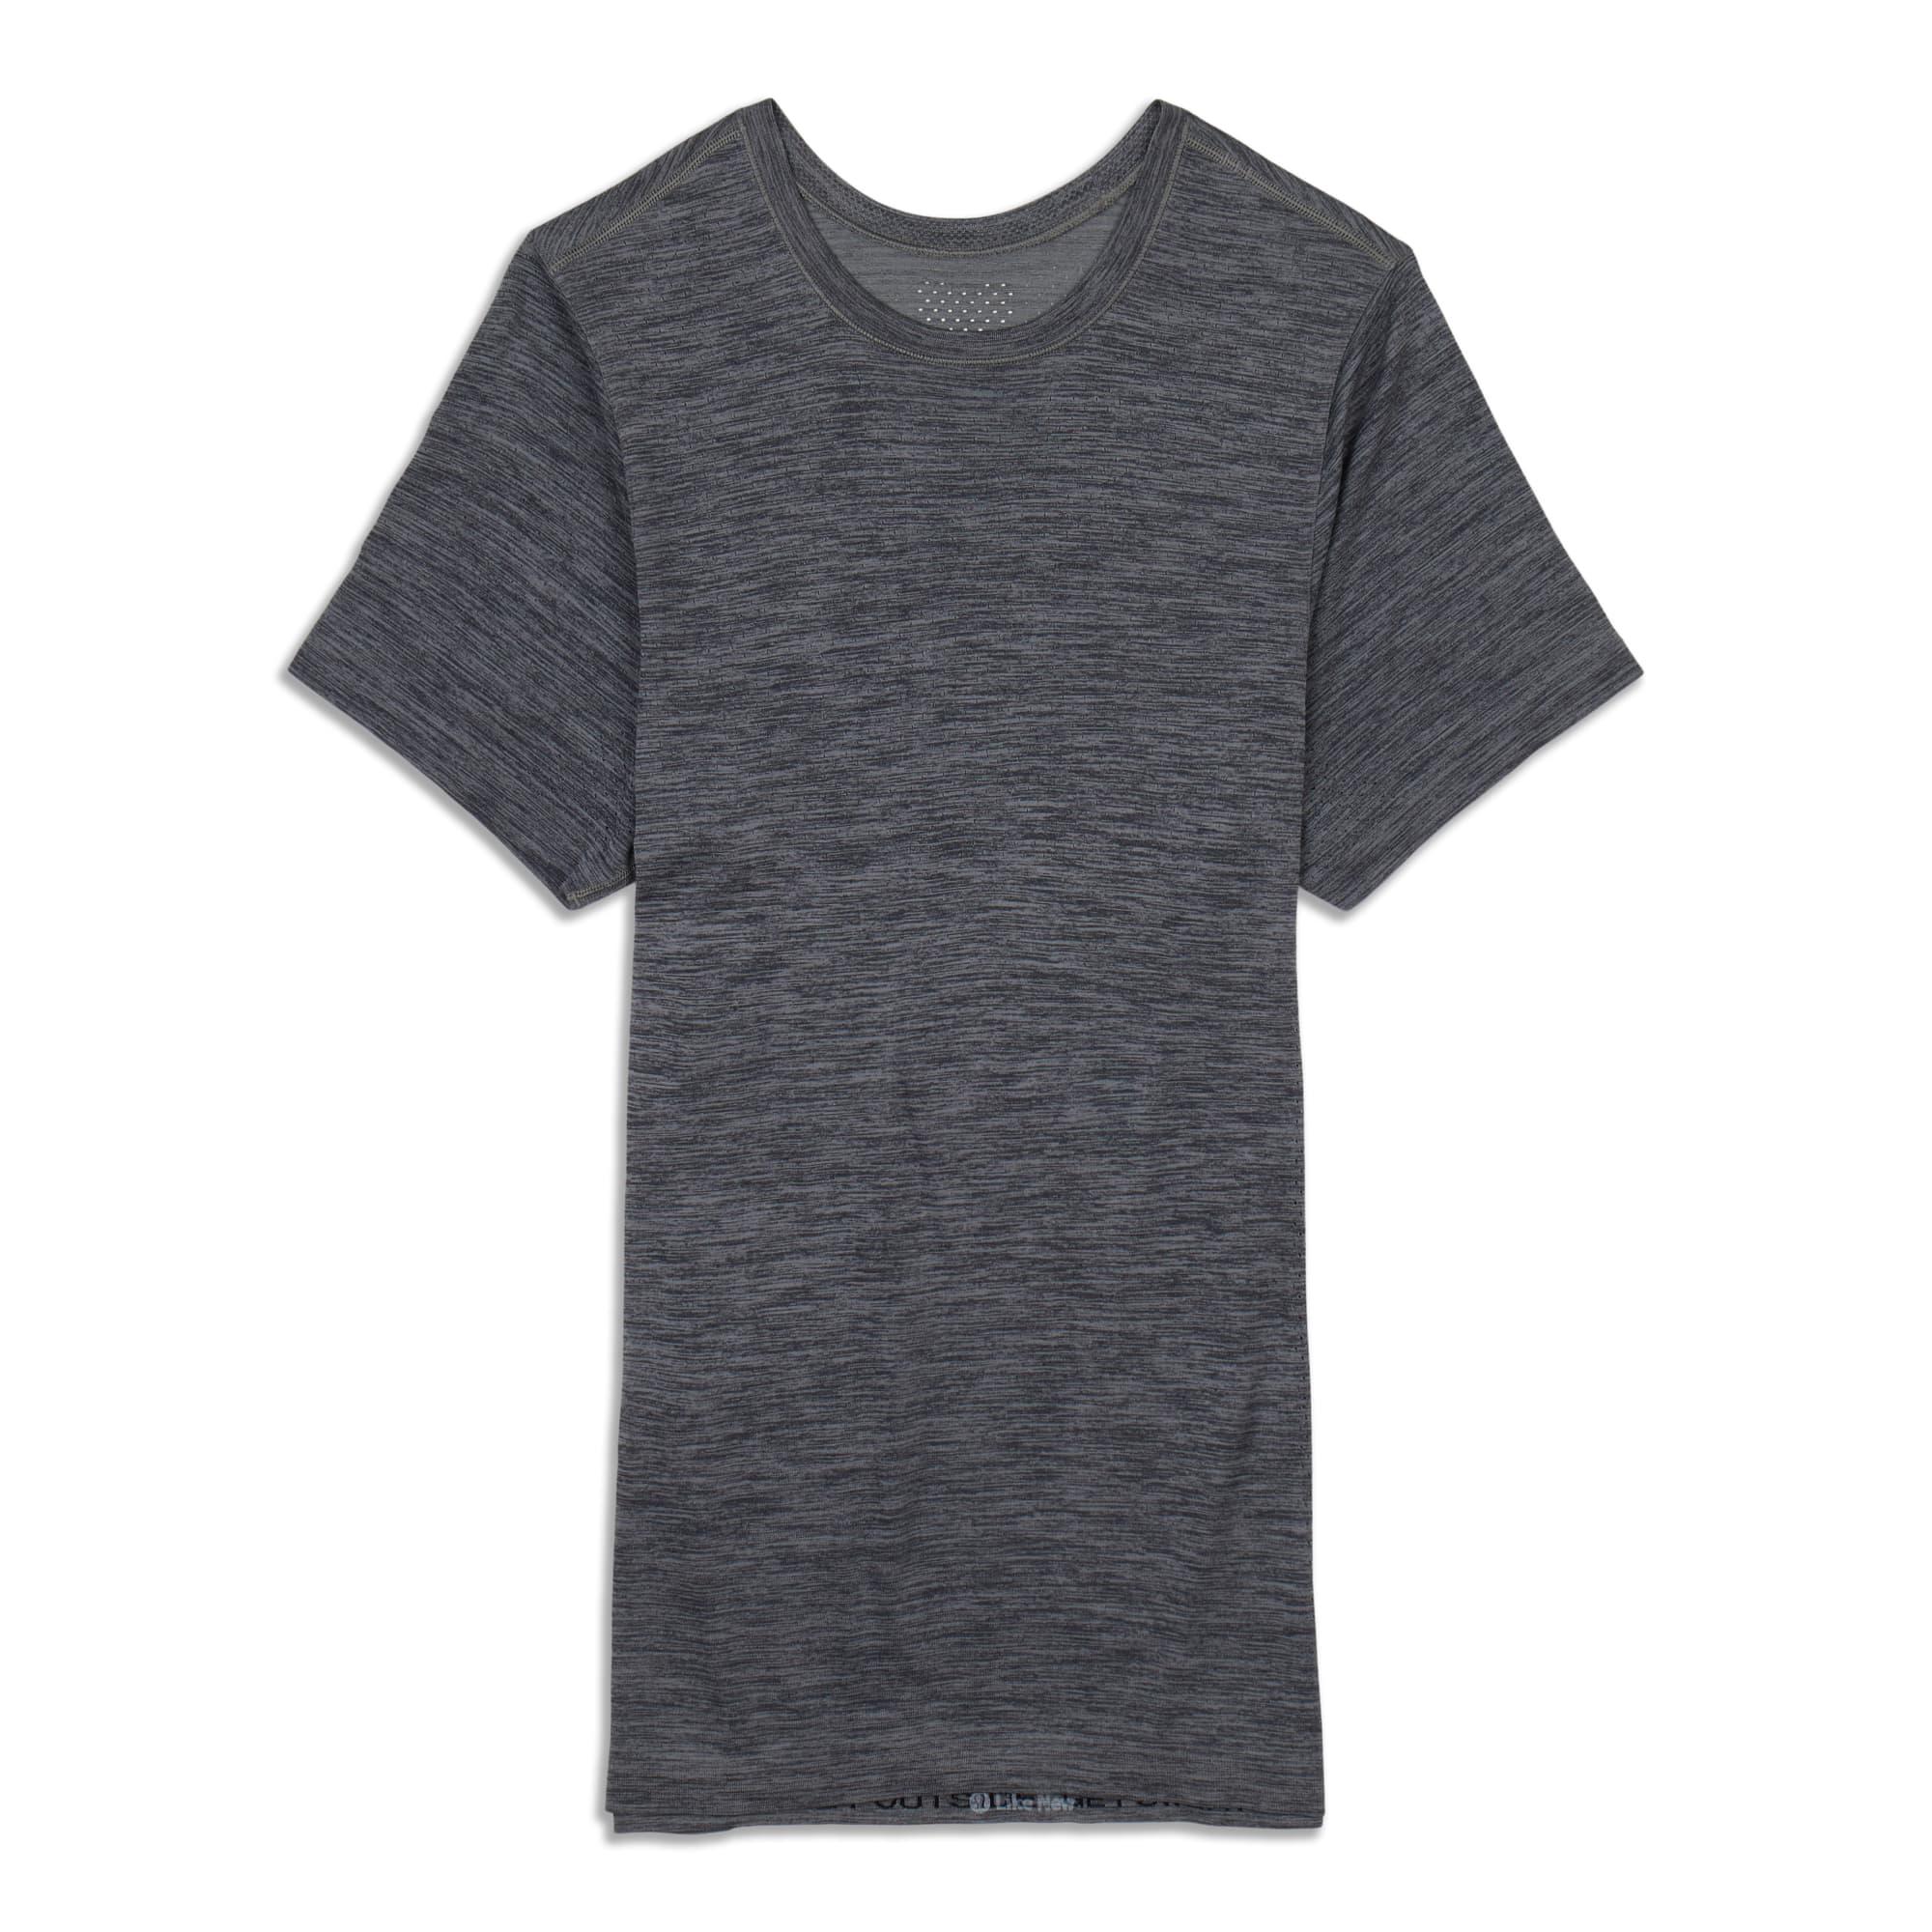 Main product image: Men's Shirt - Resale